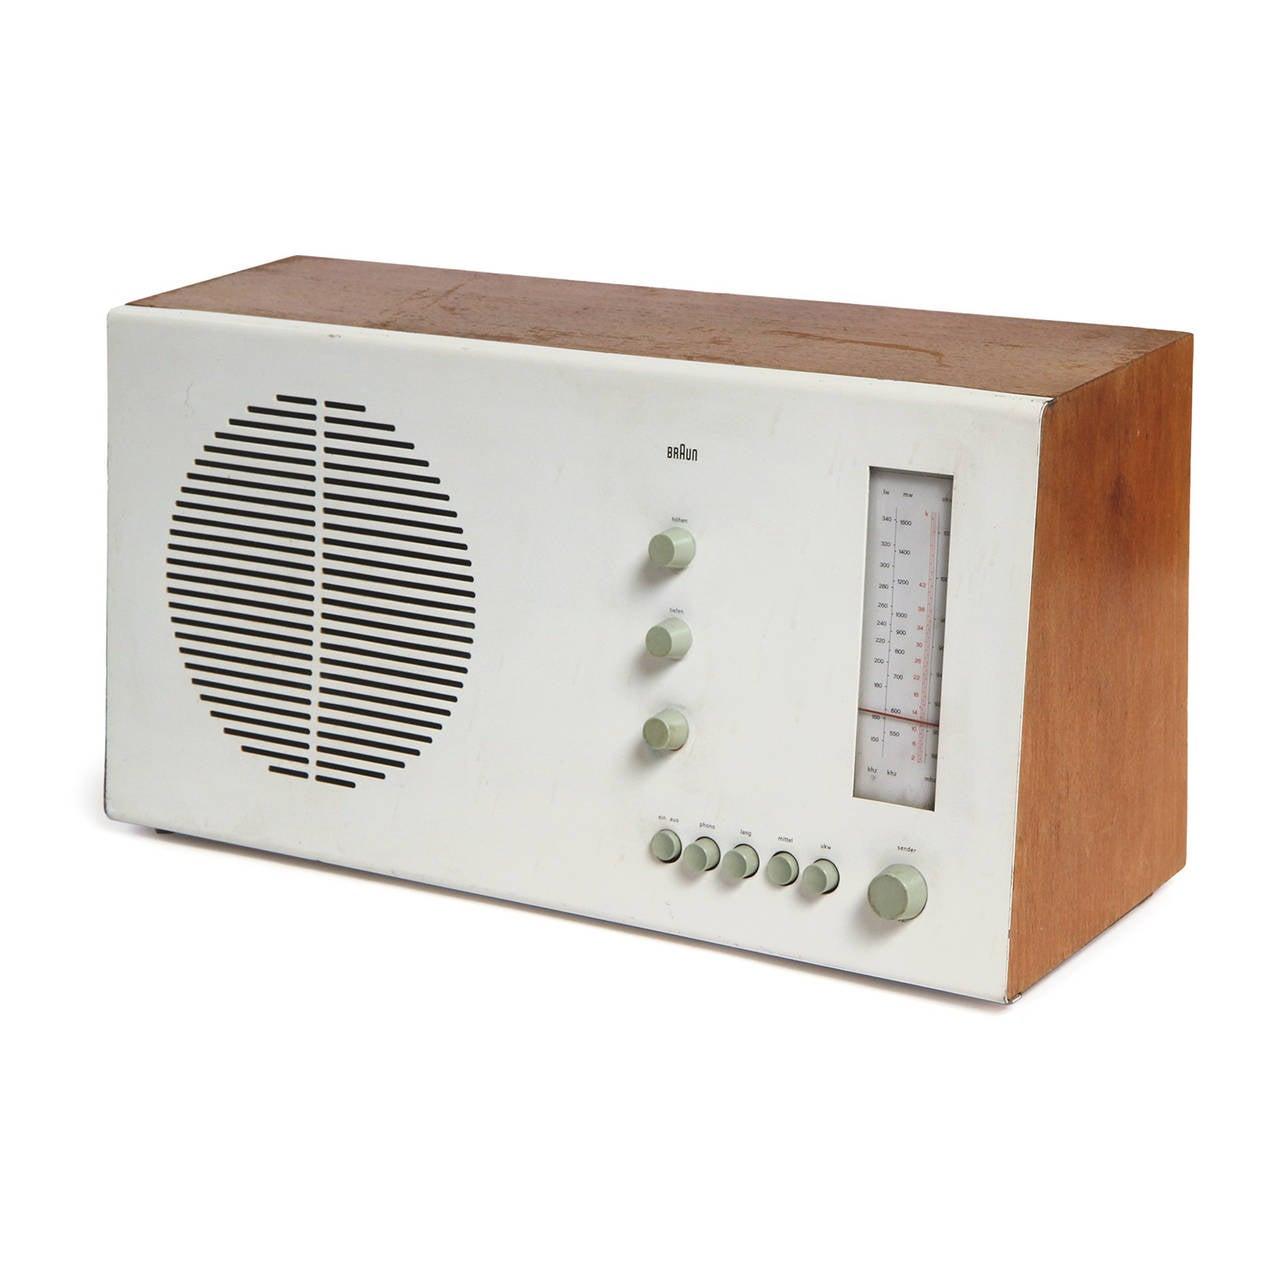 Mid-Century Modern Desk Radio by Dieter Rams